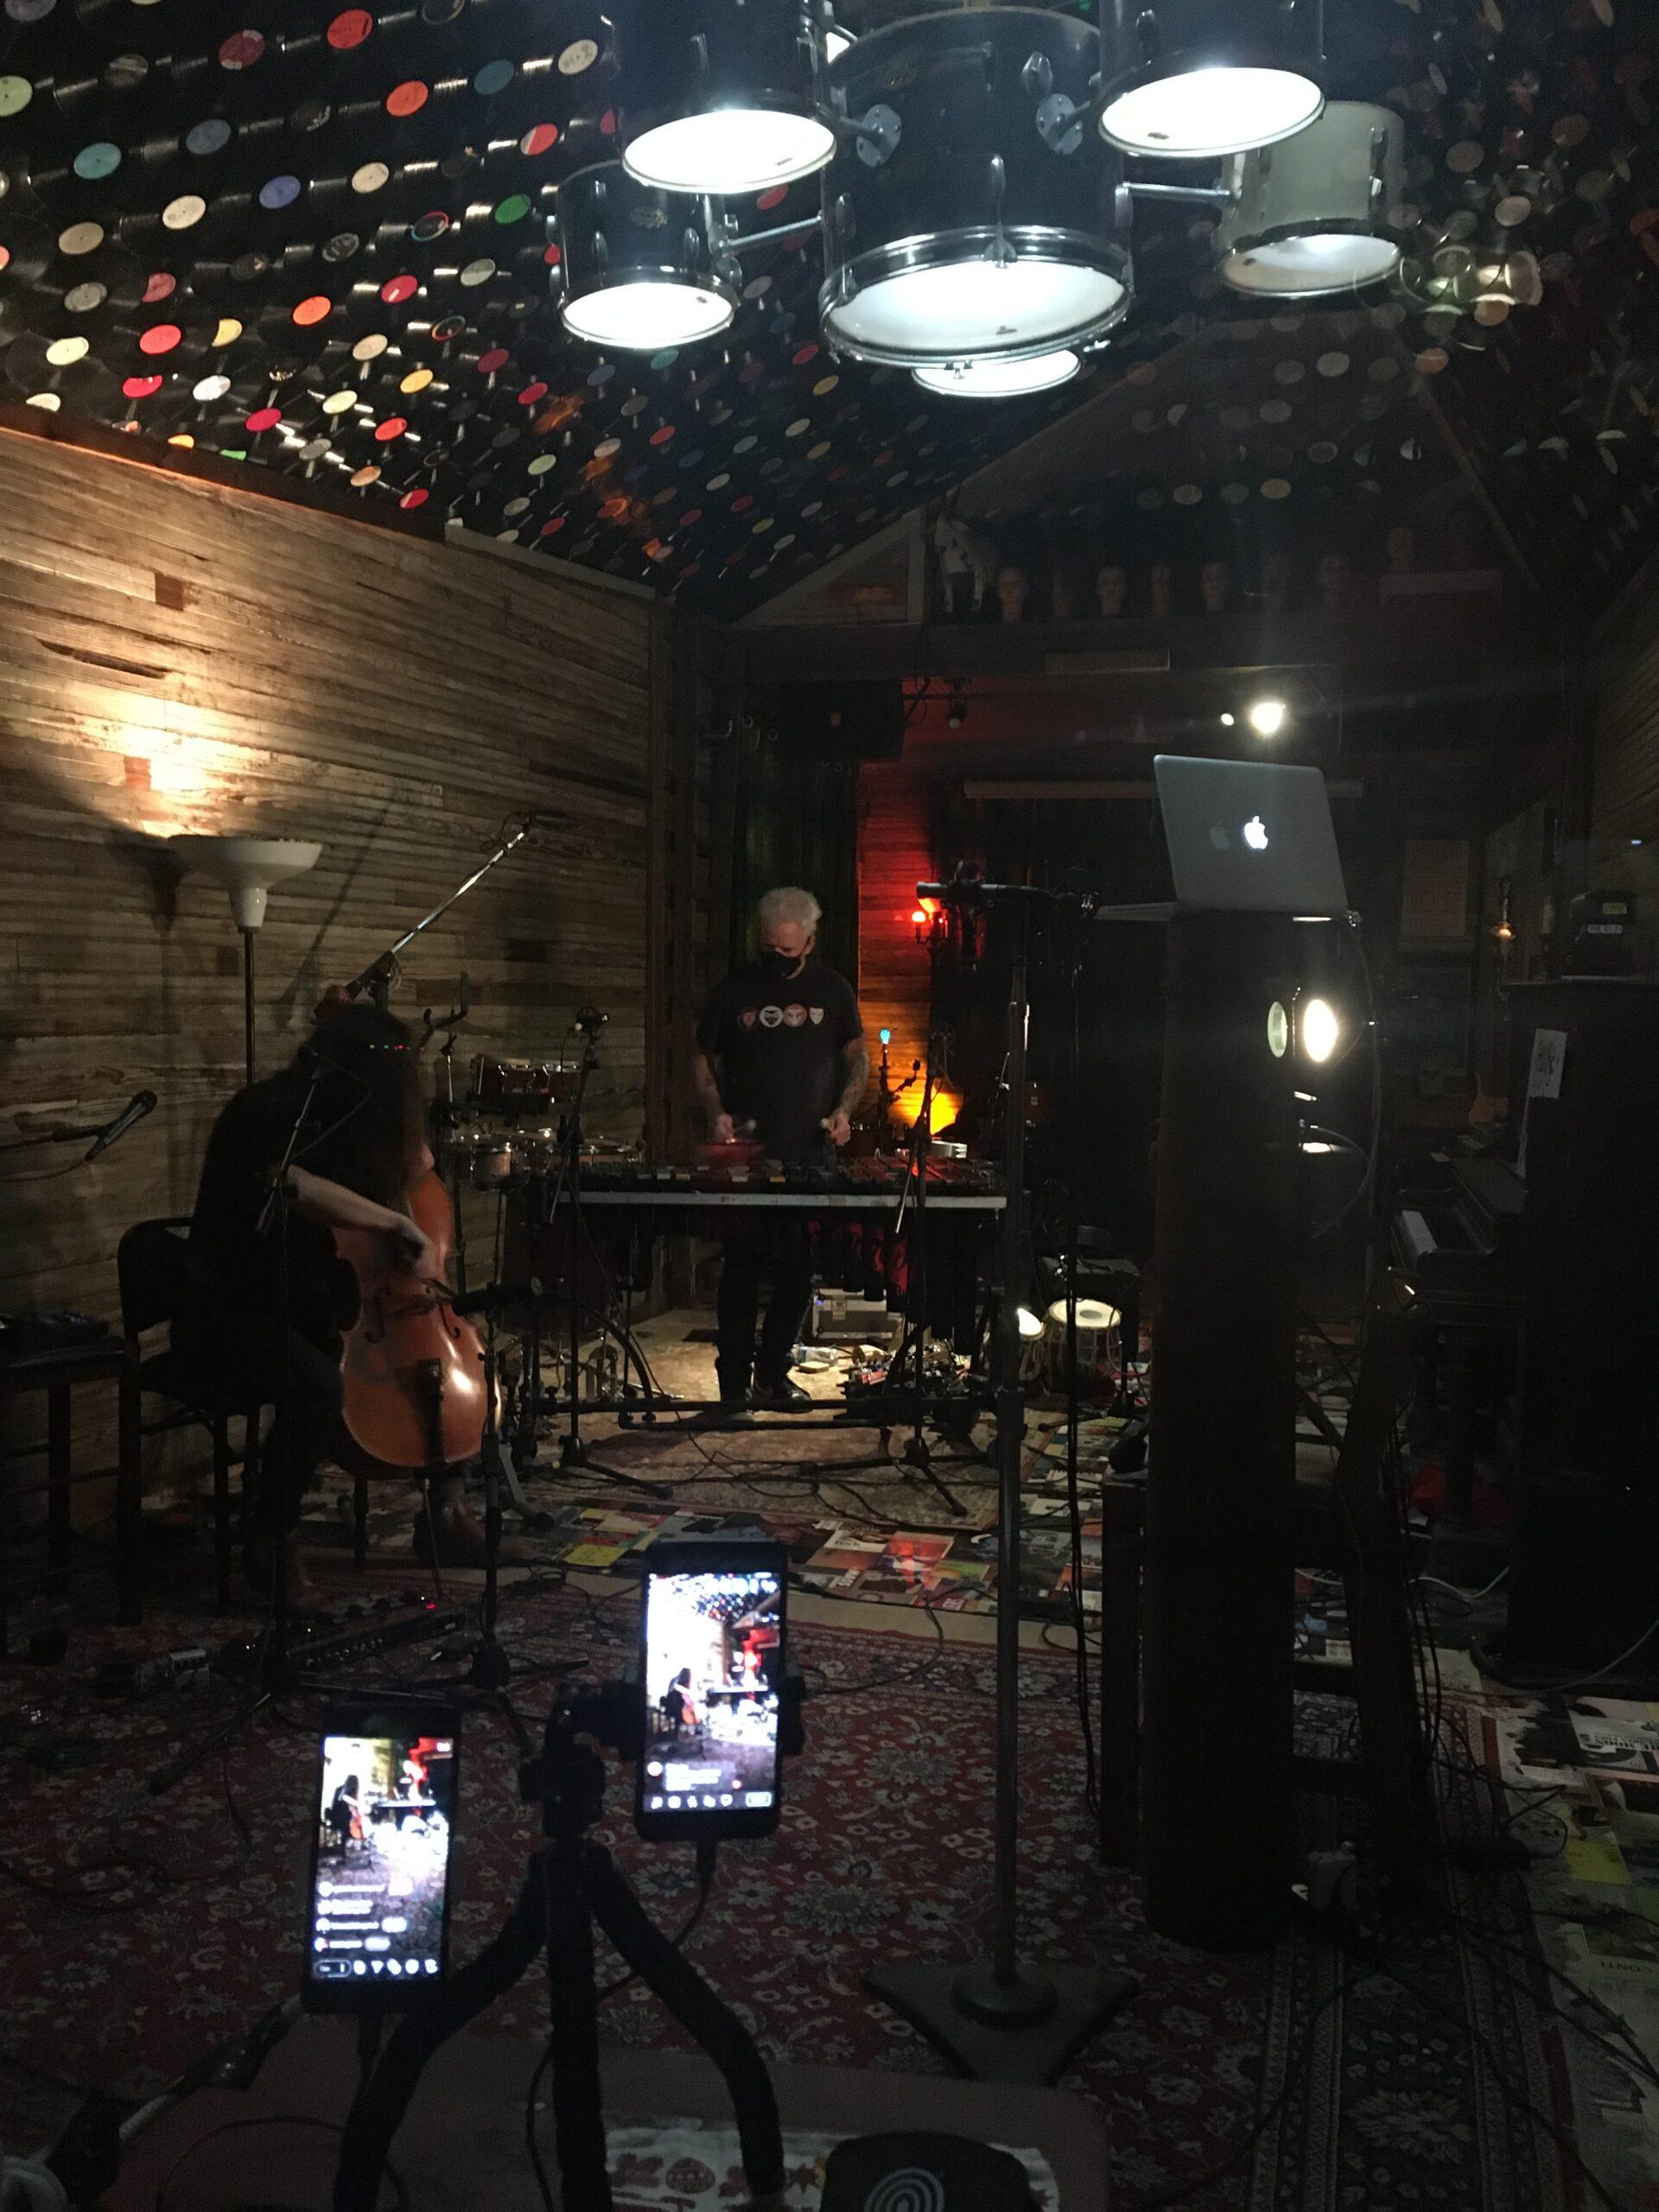 Helen Gillet / Mike Dillon livestream show & recording